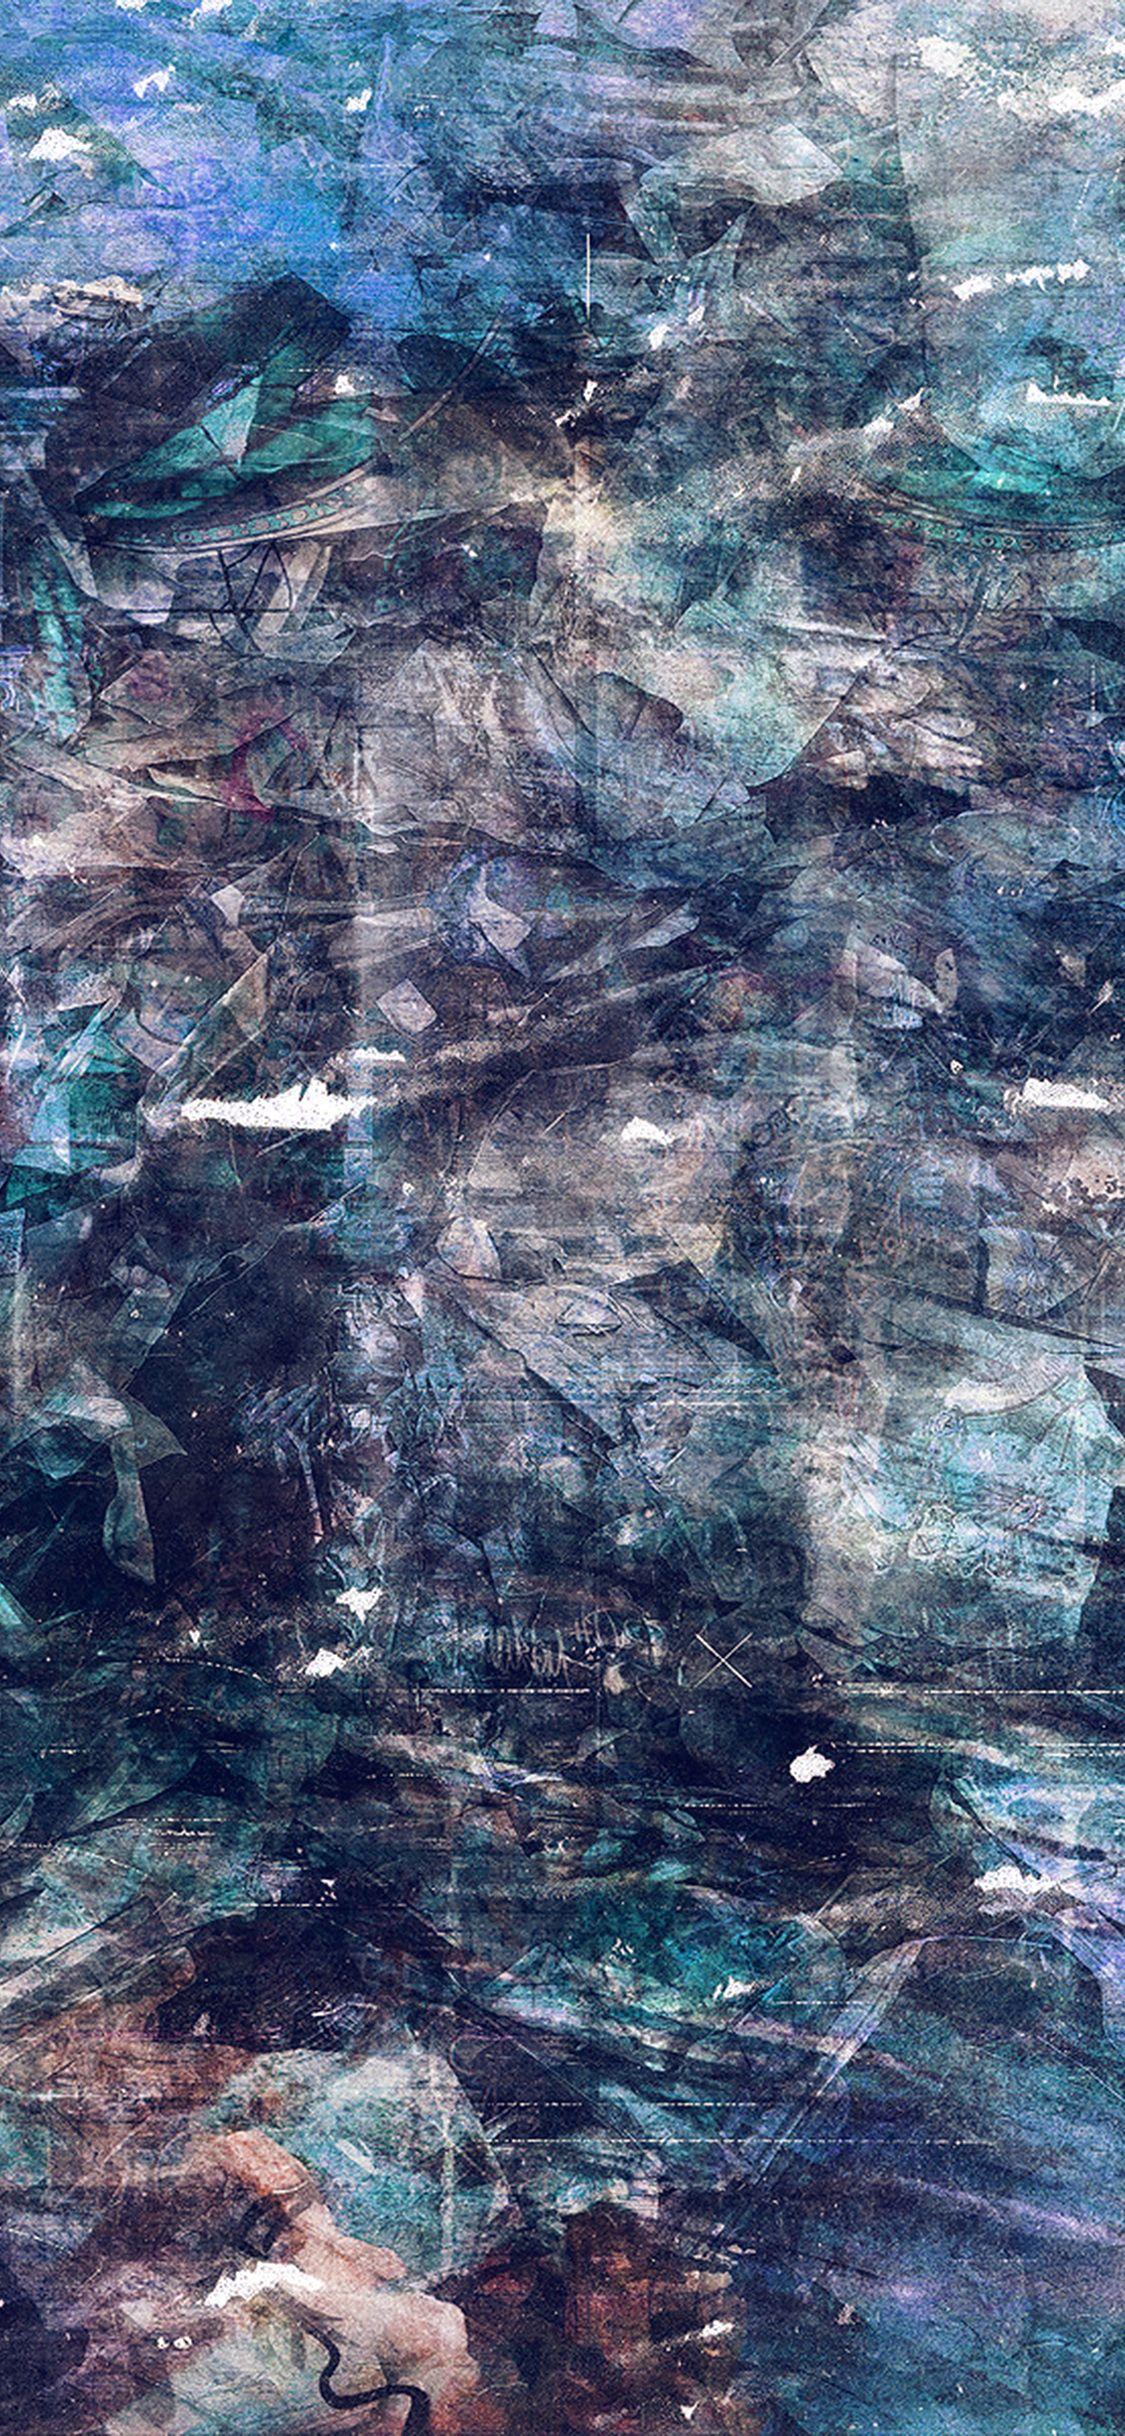 X Wallpapers By Charlotte Sauer Al29 Wonder Lust Art Illust Grunge Abstract Blue Via